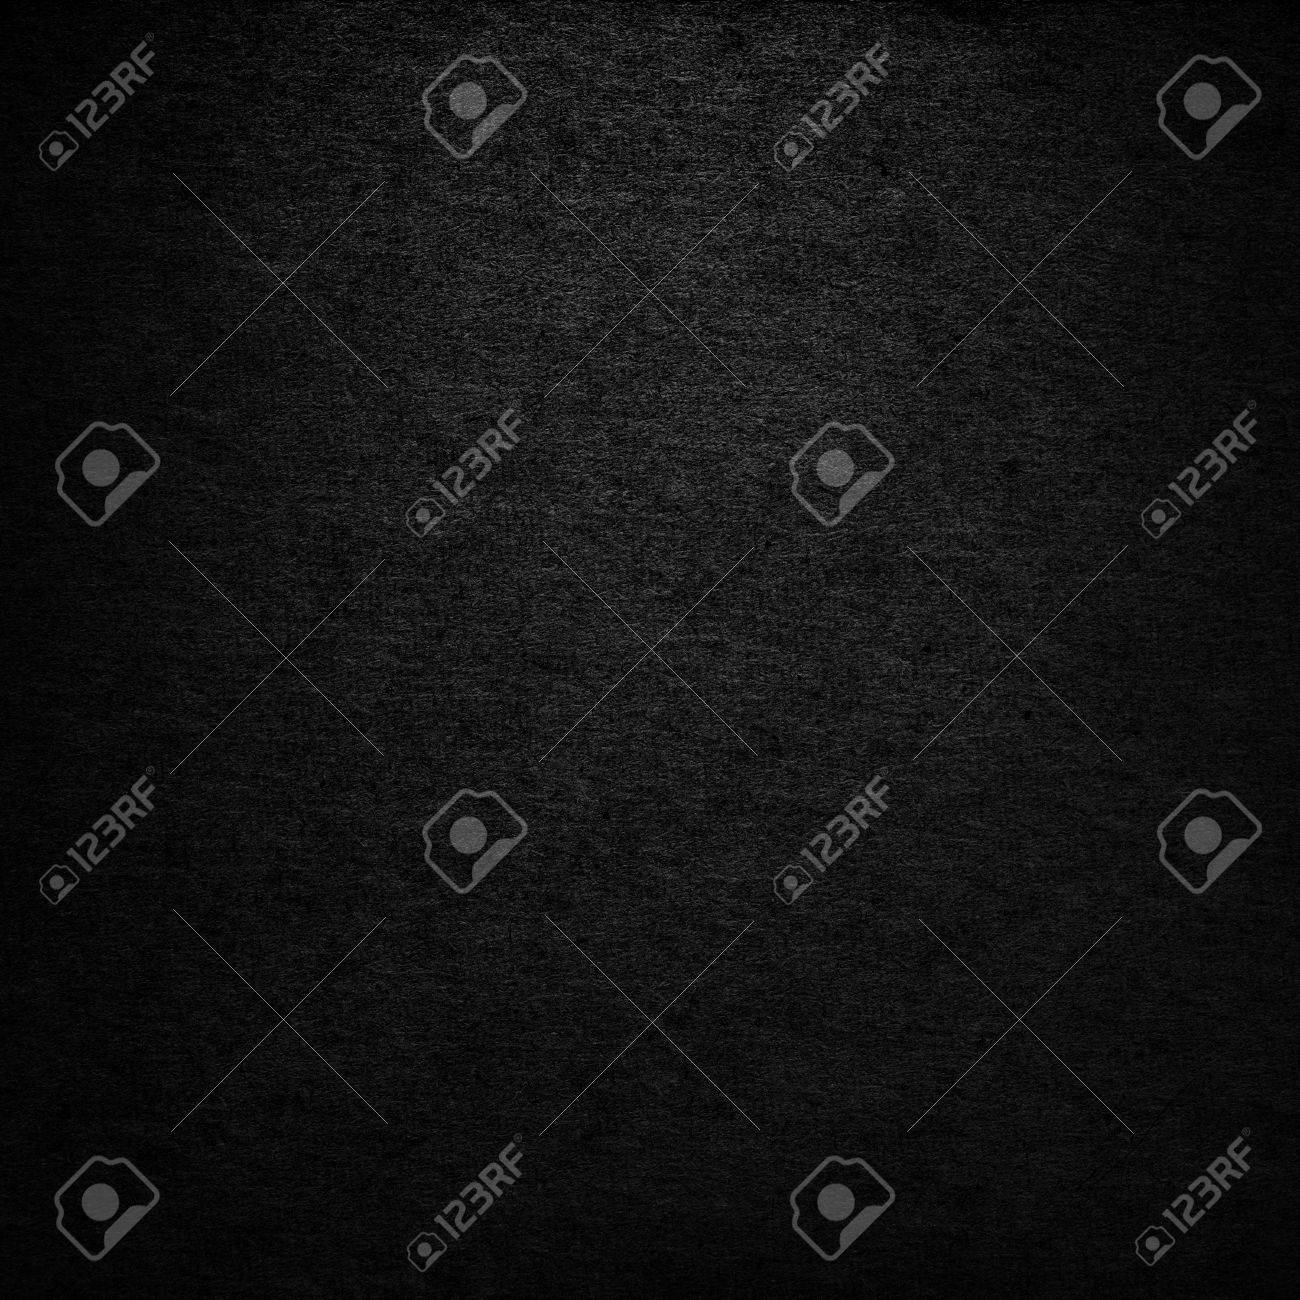 paper texture. black background - 34788179